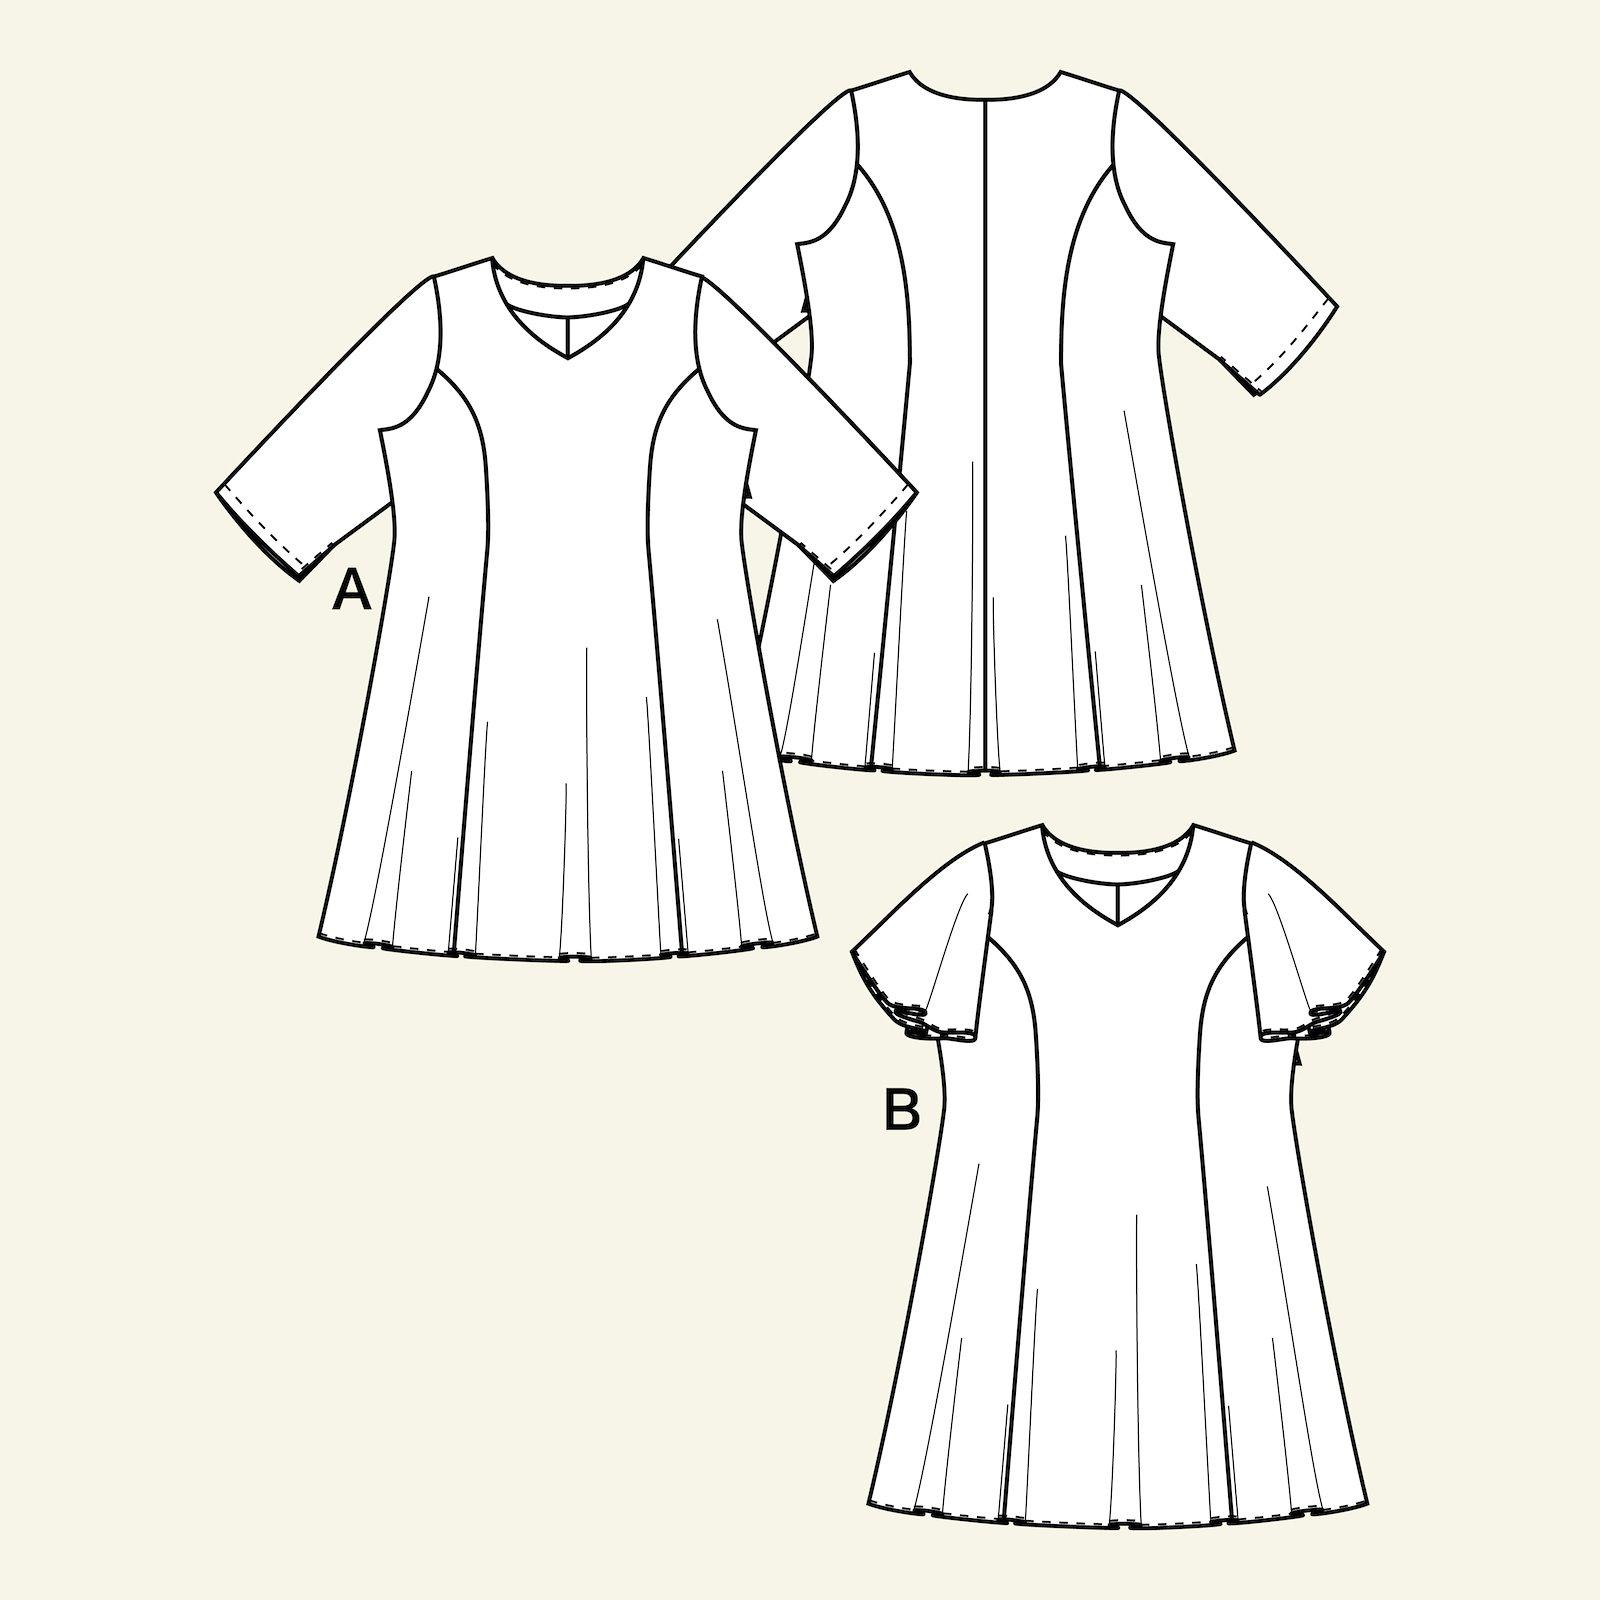 Dress with a princess cut, 56/28 p73016_pack